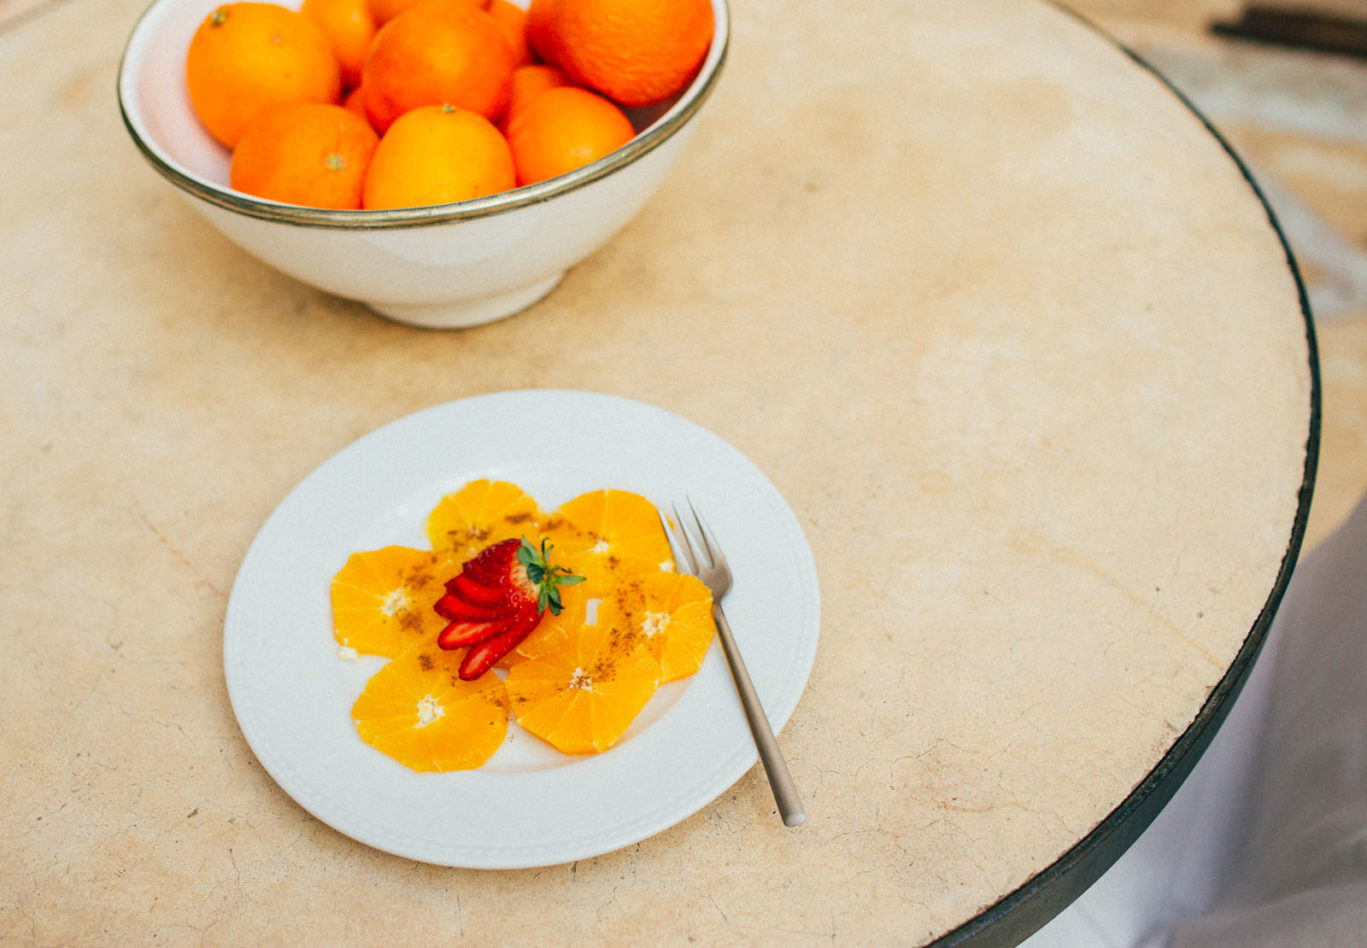 orange-bowl-plate-strawberry